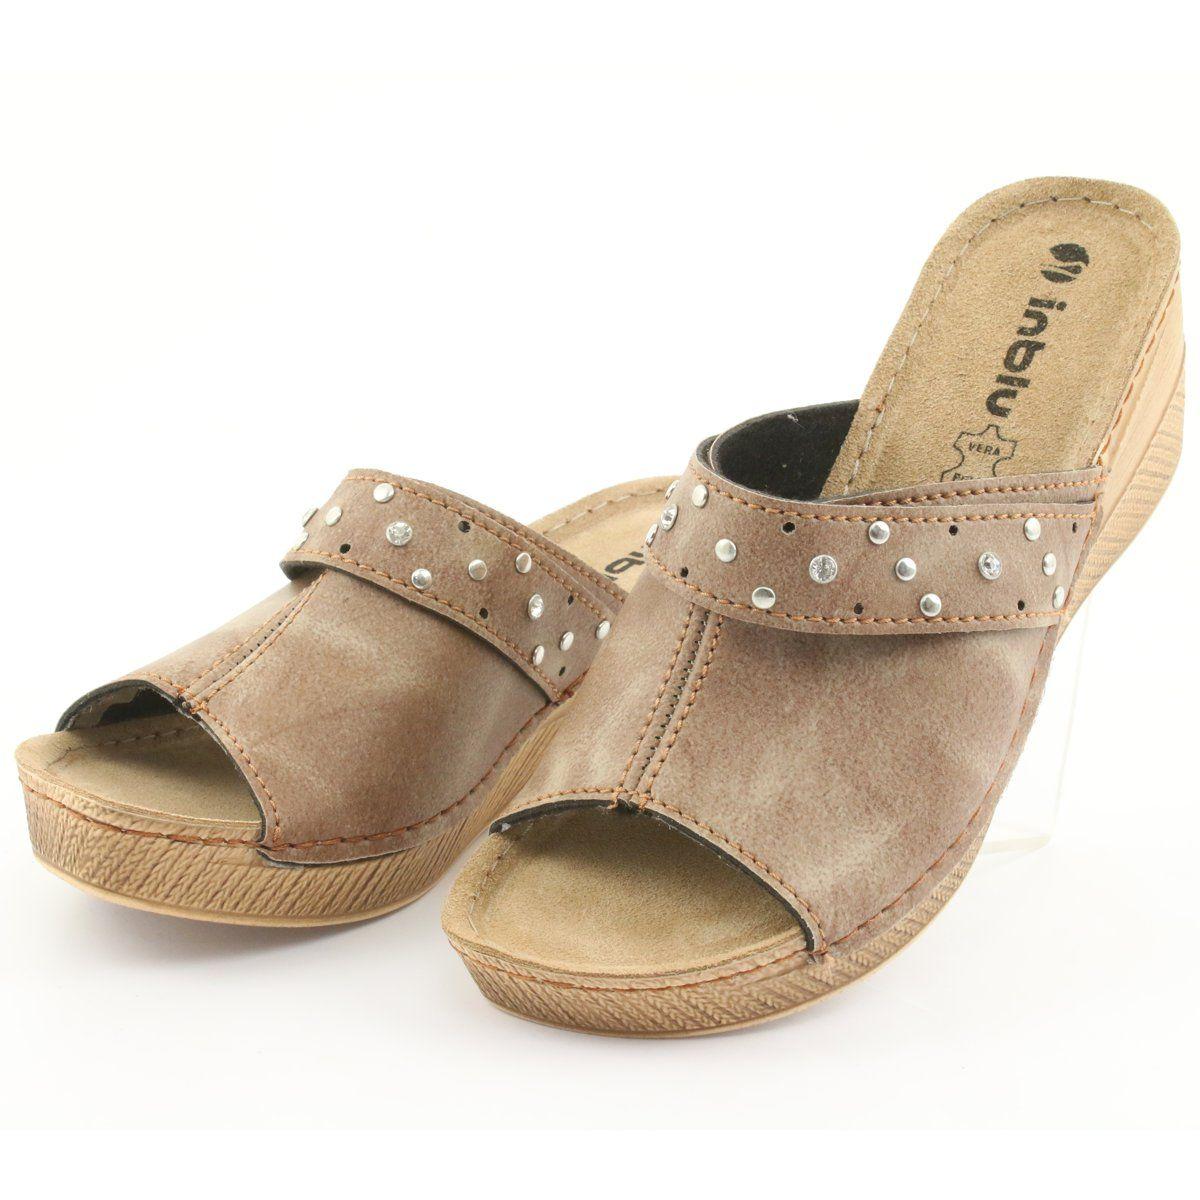 Klapki Damskie Koturno Inblu Os007 Brazowe Womens Slippers Comfortable Work Shoes Elegant Slippers